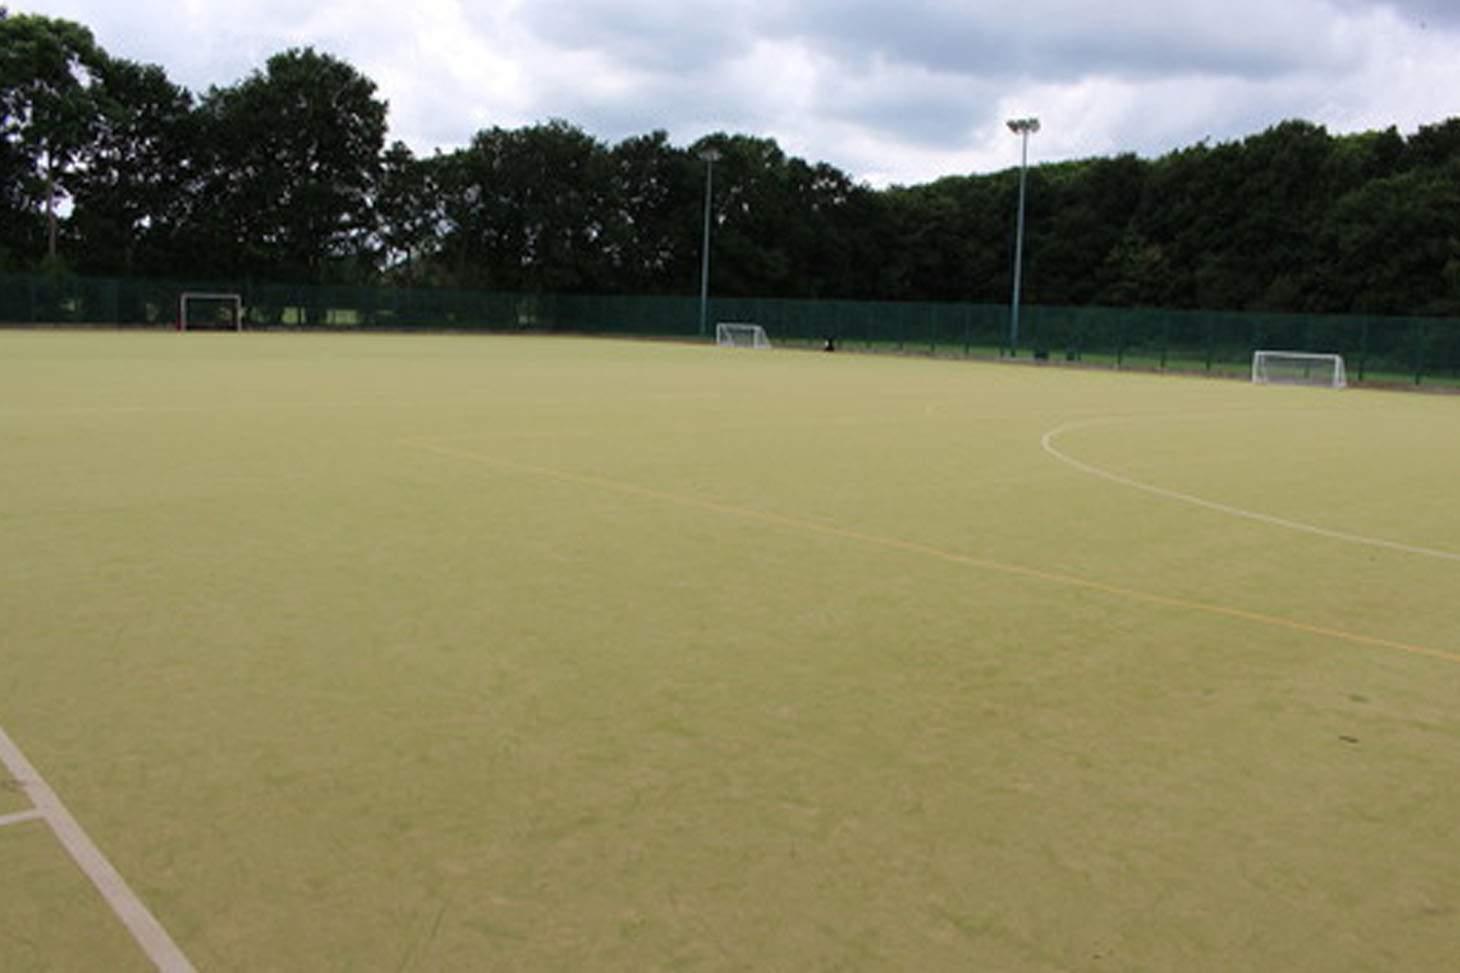 Light Hall School 5 a side | Astroturf football pitch